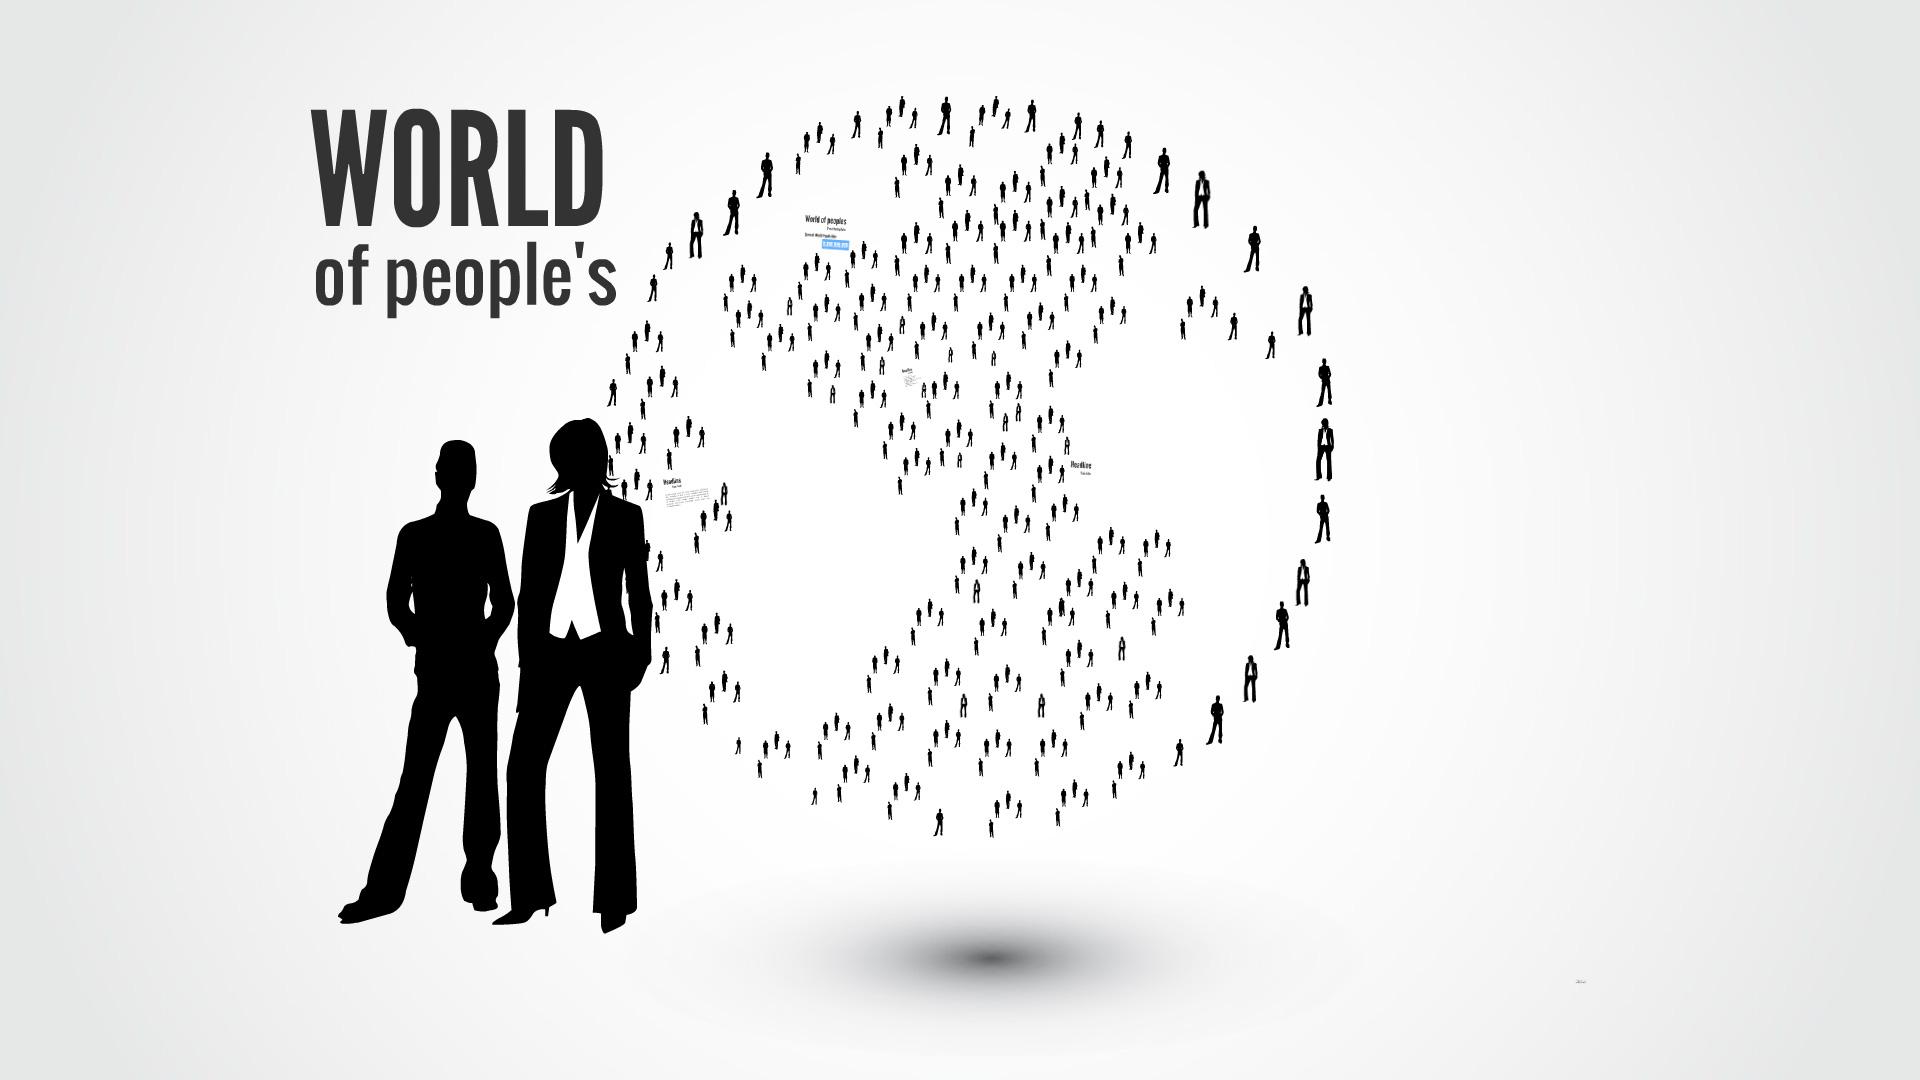 World of peoples Prezi template